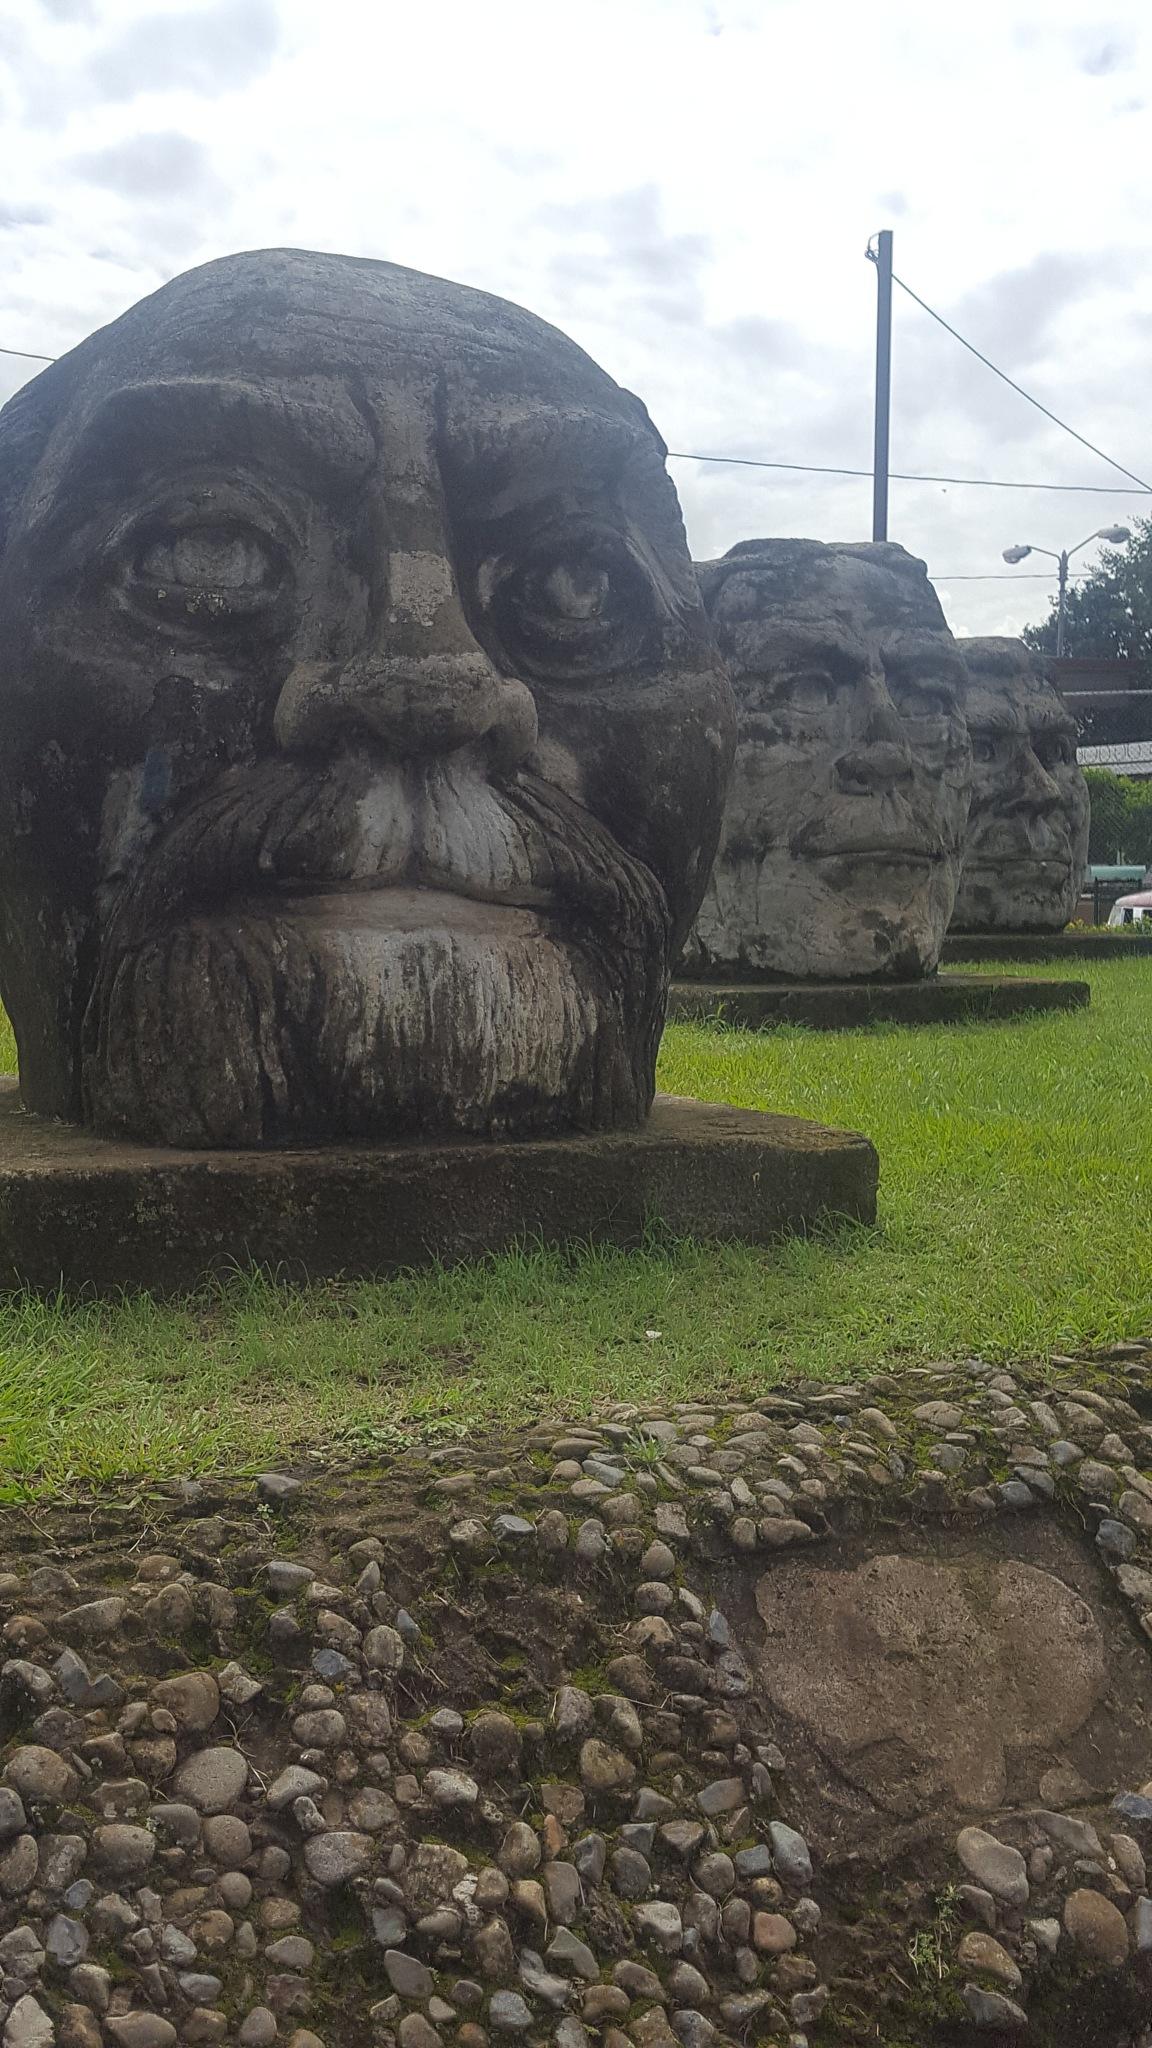 Parque de los cabezones  by Chevez Gabriela